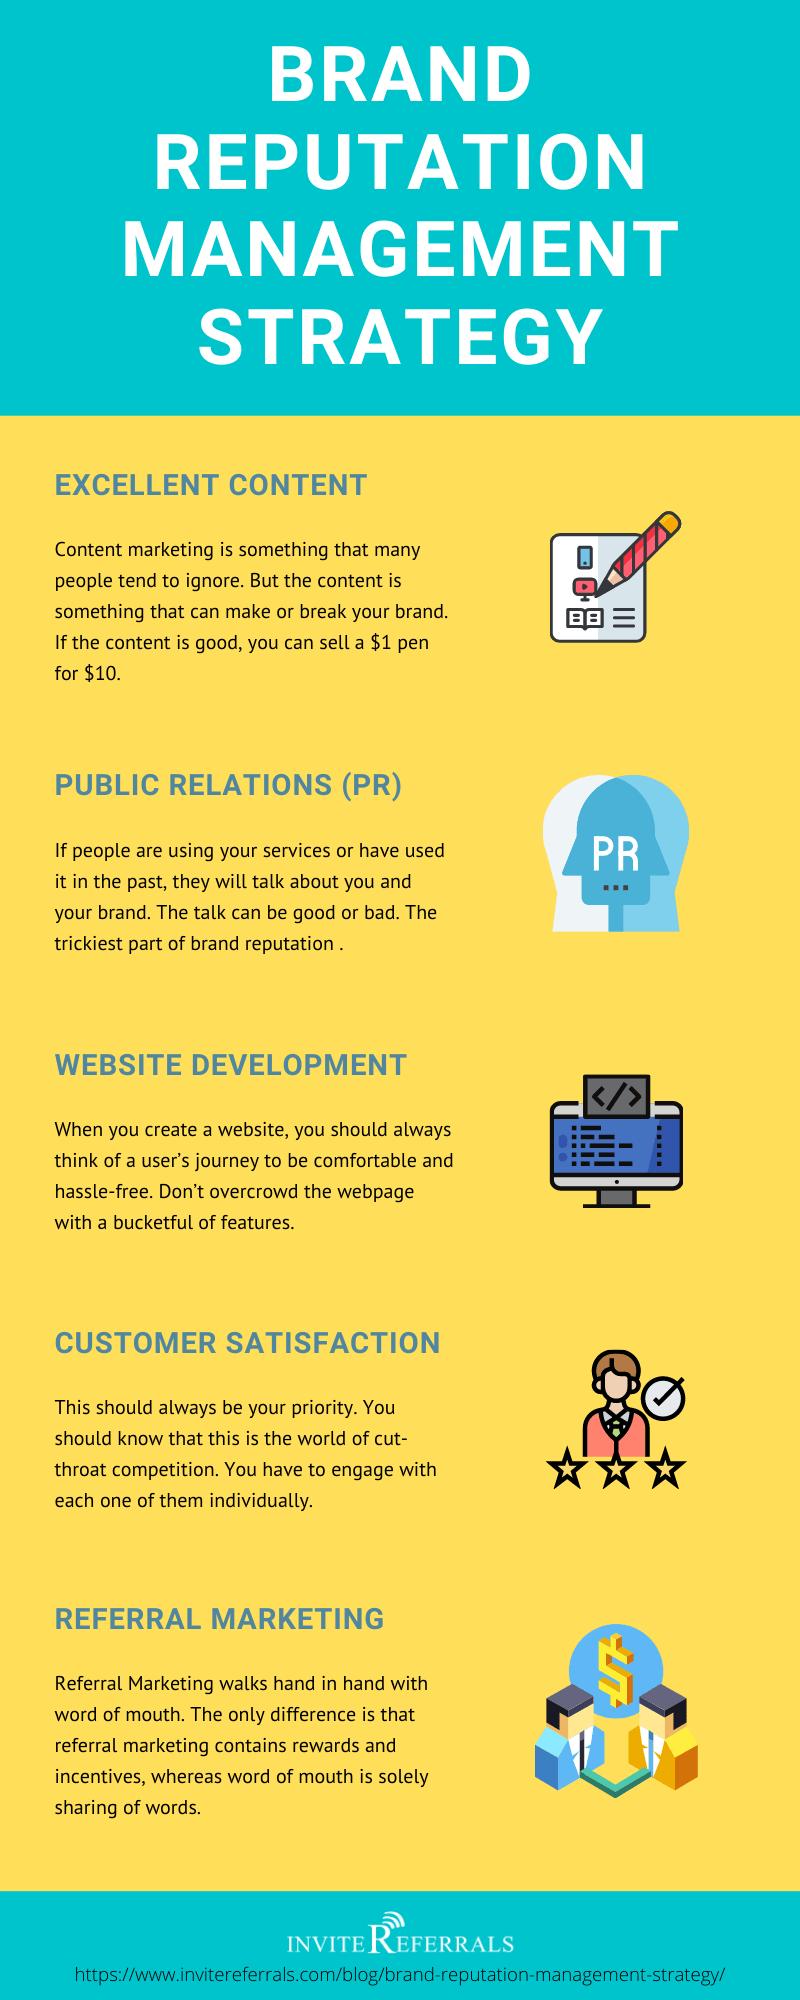 Brand reputation management infographic